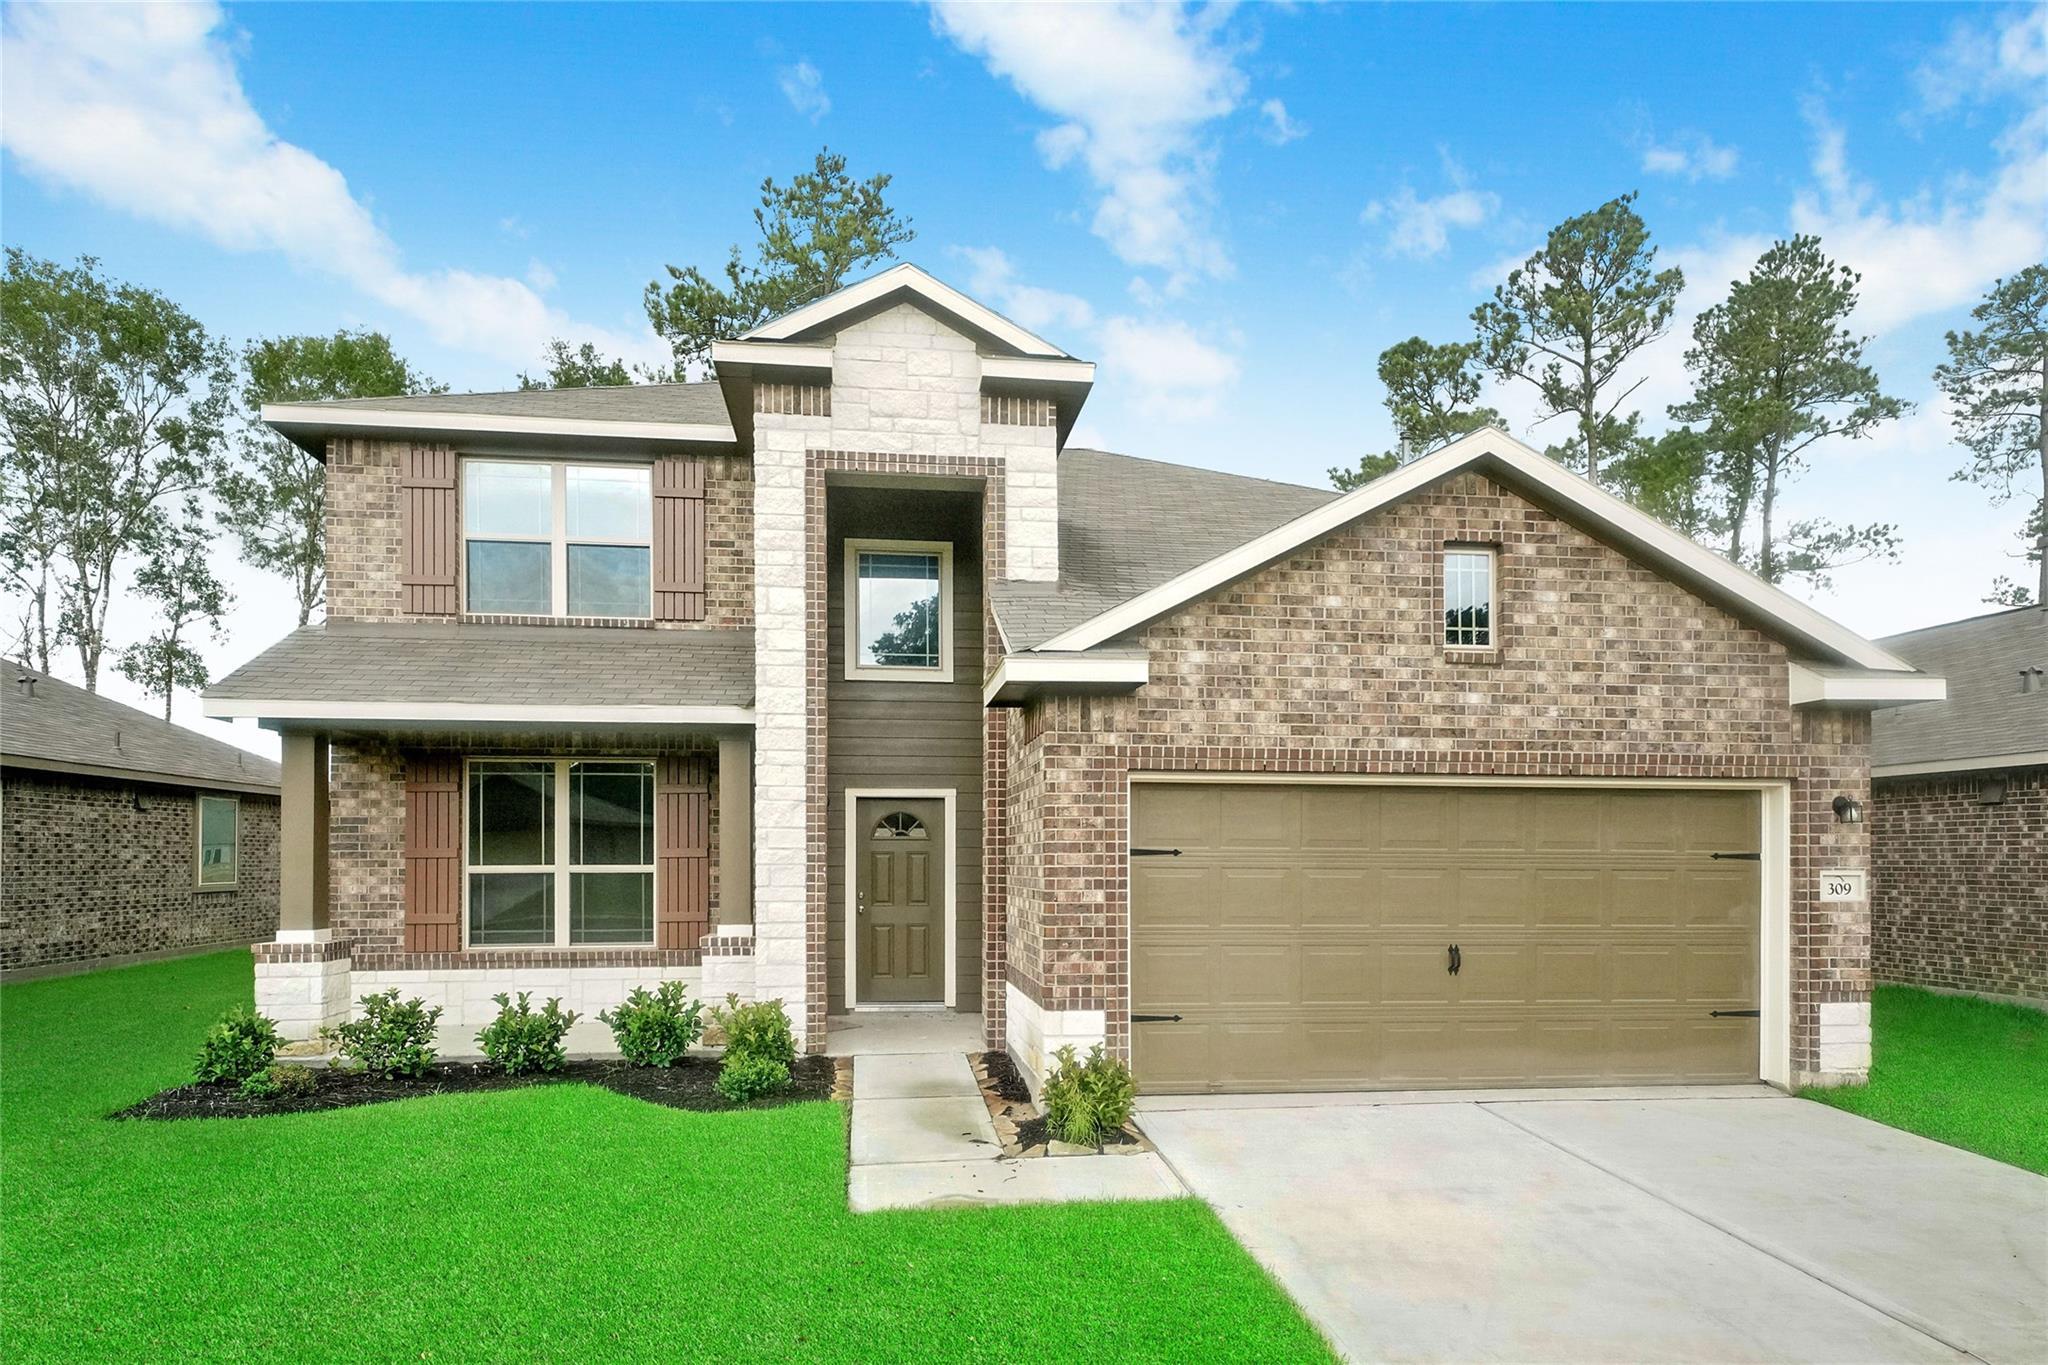 1102 Bernard Meadows Property Photo - East Bernard, TX real estate listing